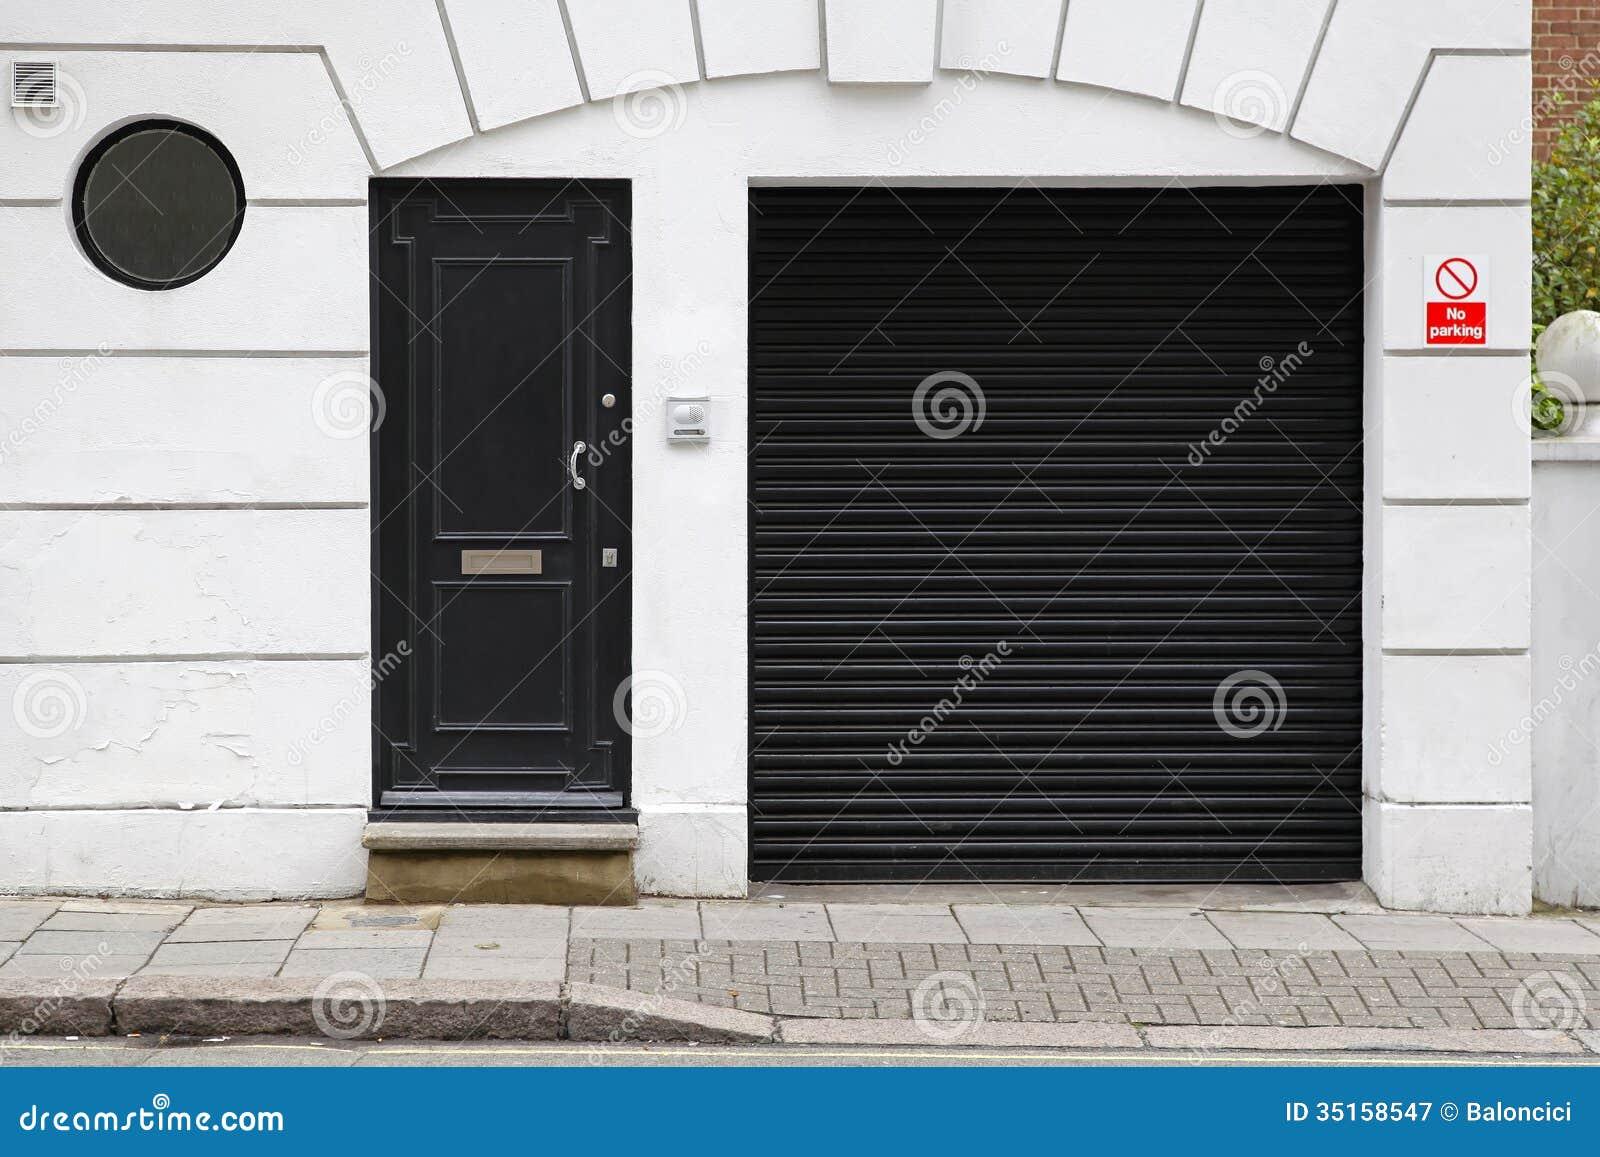 Grey house black garage doors - 9573919194937201300 Black Garage And Entrance Door At White House Bf0c0c Black Door White House 1300957